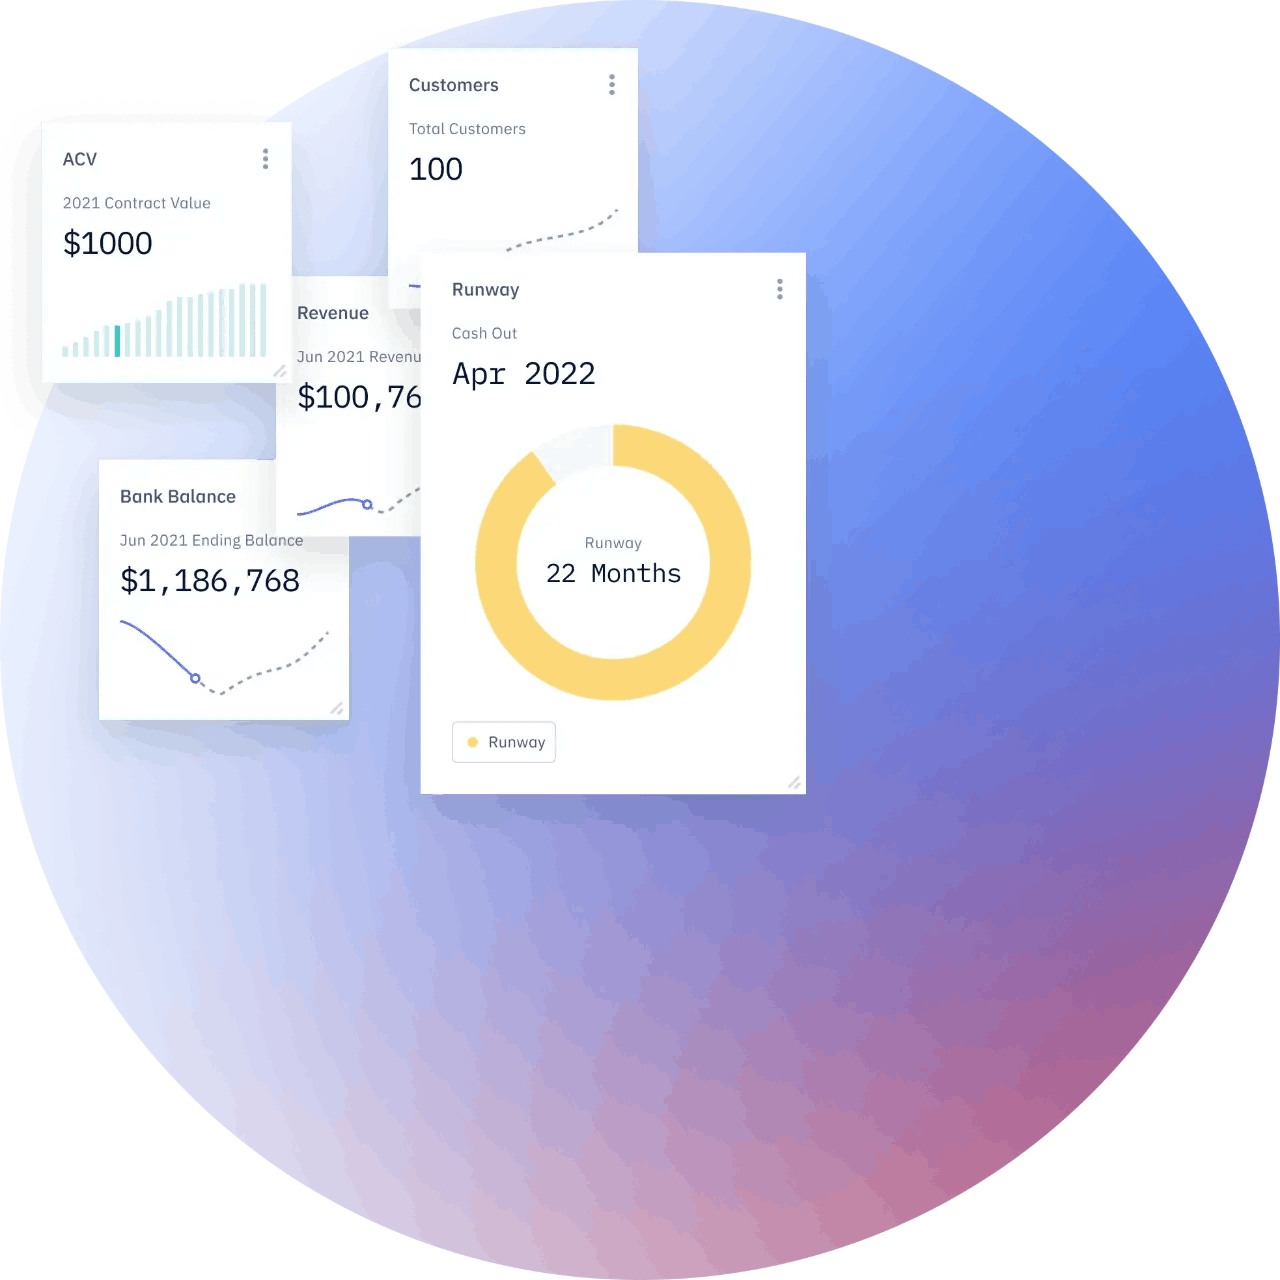 Pry dashboard metrics showing runway, customers, revenue, ACV, and bank balance